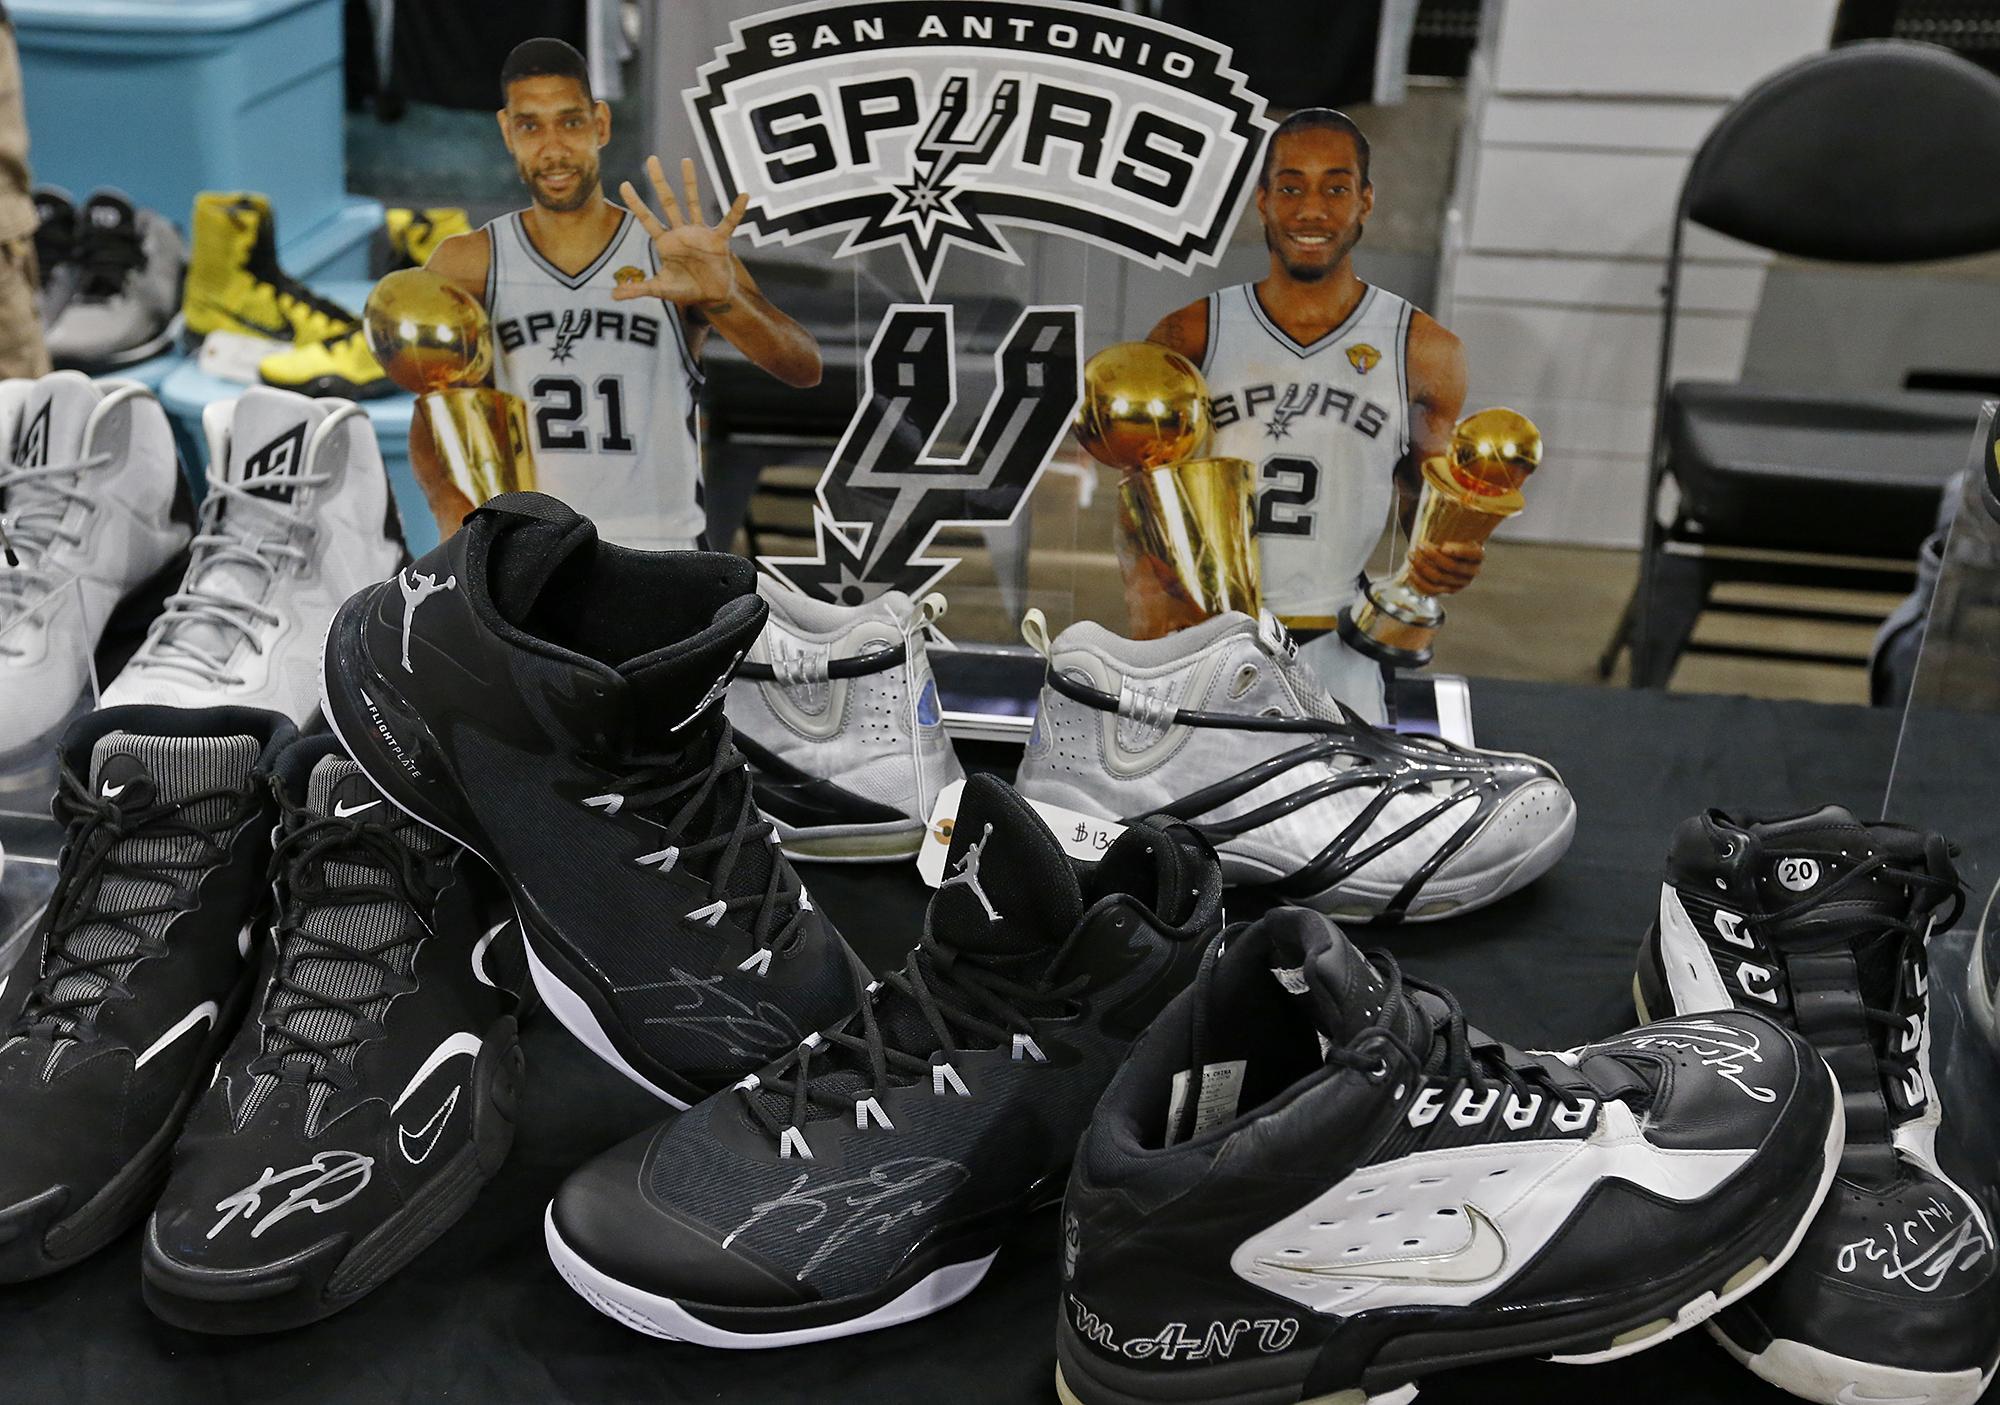 2c2f6c7b76d San Antonio sneakerheads appreciate  the art  of shoes - San Antonio ...